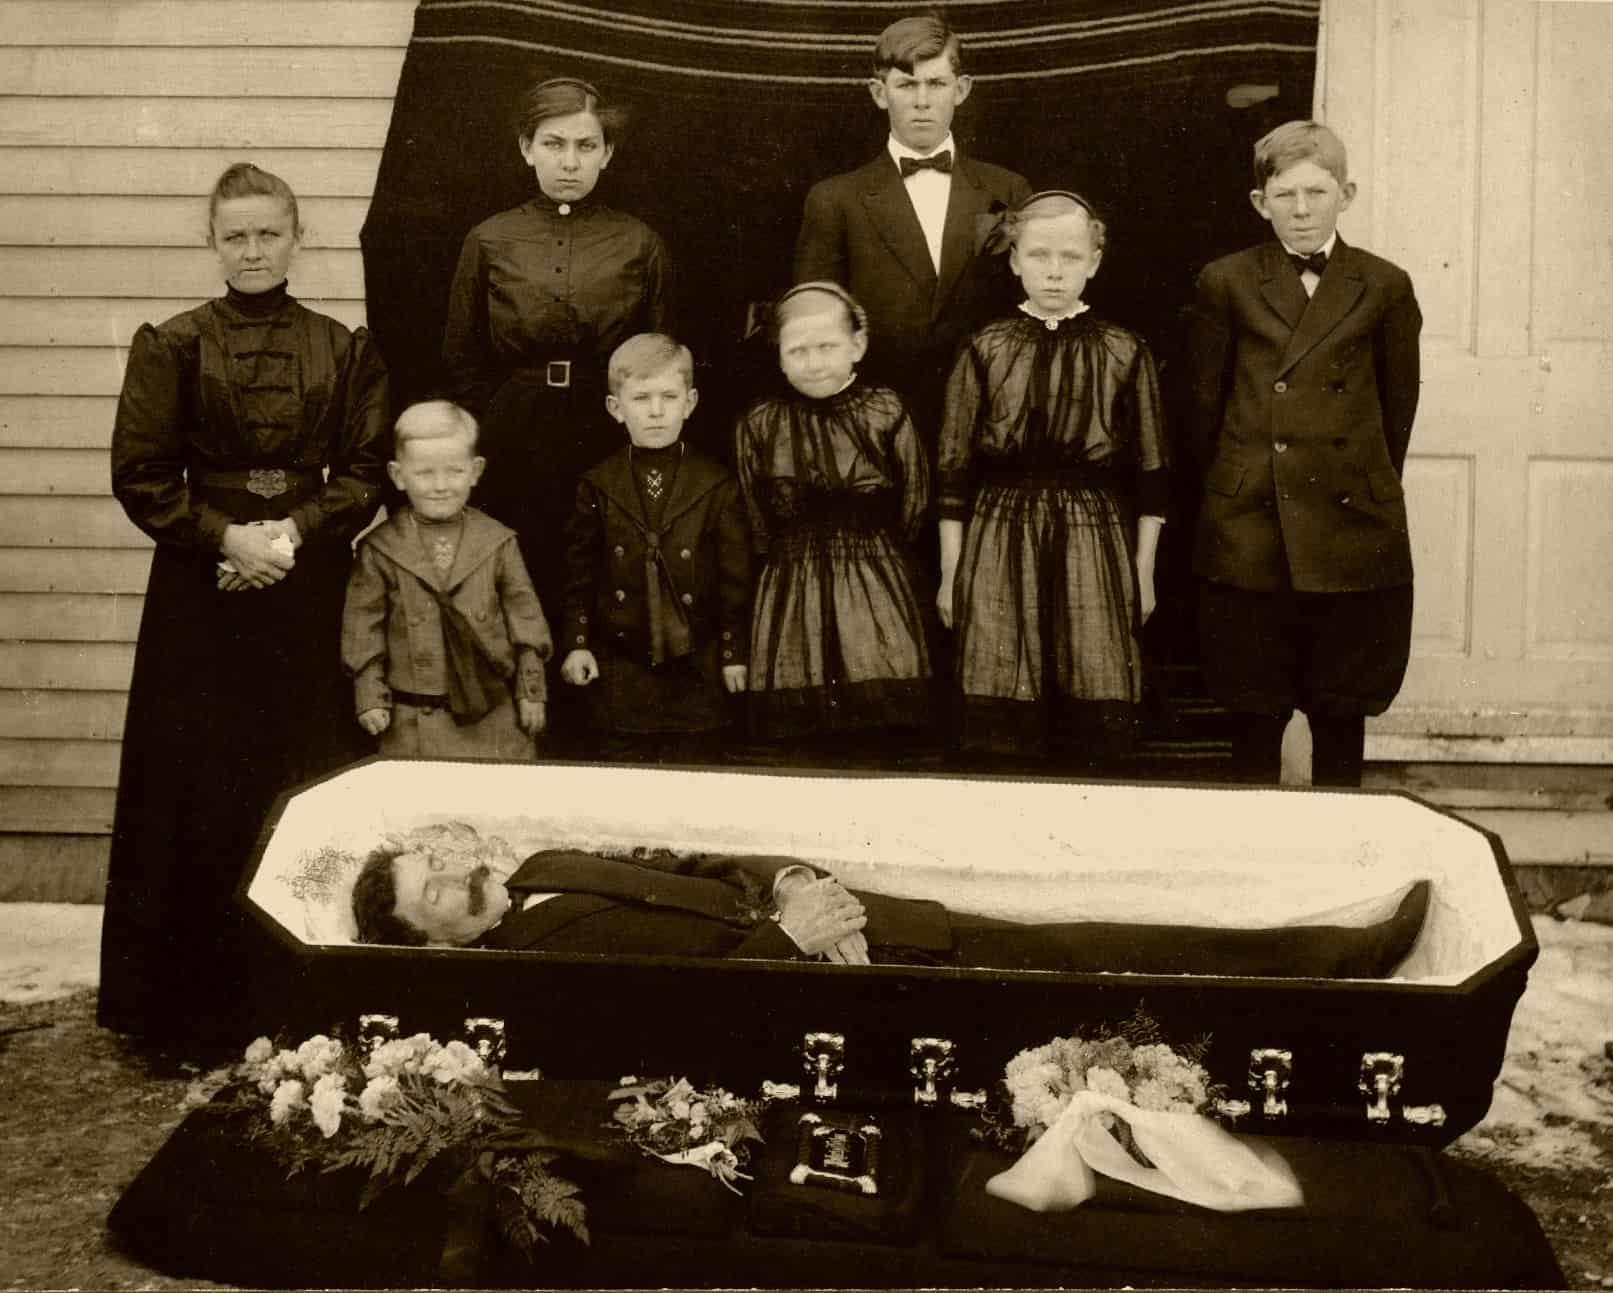 Http Gentlemansgazette Com Funeral Etiquette Clothes Thank You Cards Flowers